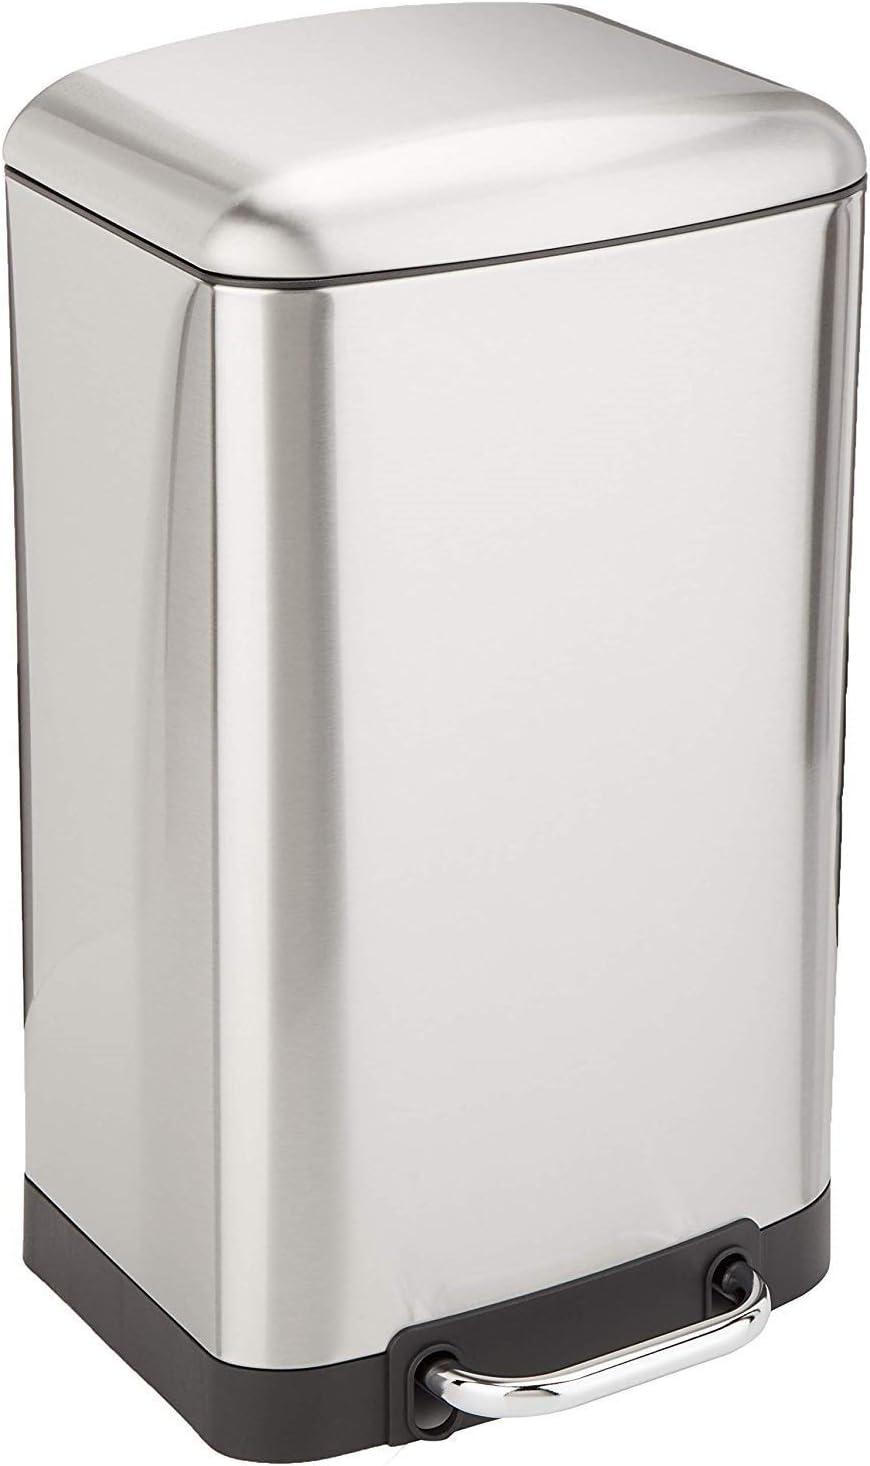 KITCHEN MOVE 905567E - Cubo de Basura de Cocina con Pedal Greenwich, Capacidad 30 L, 35 x 33 x 62 cm, Acero Inoxidable Cepillado, 35 x 33 x 62 cm